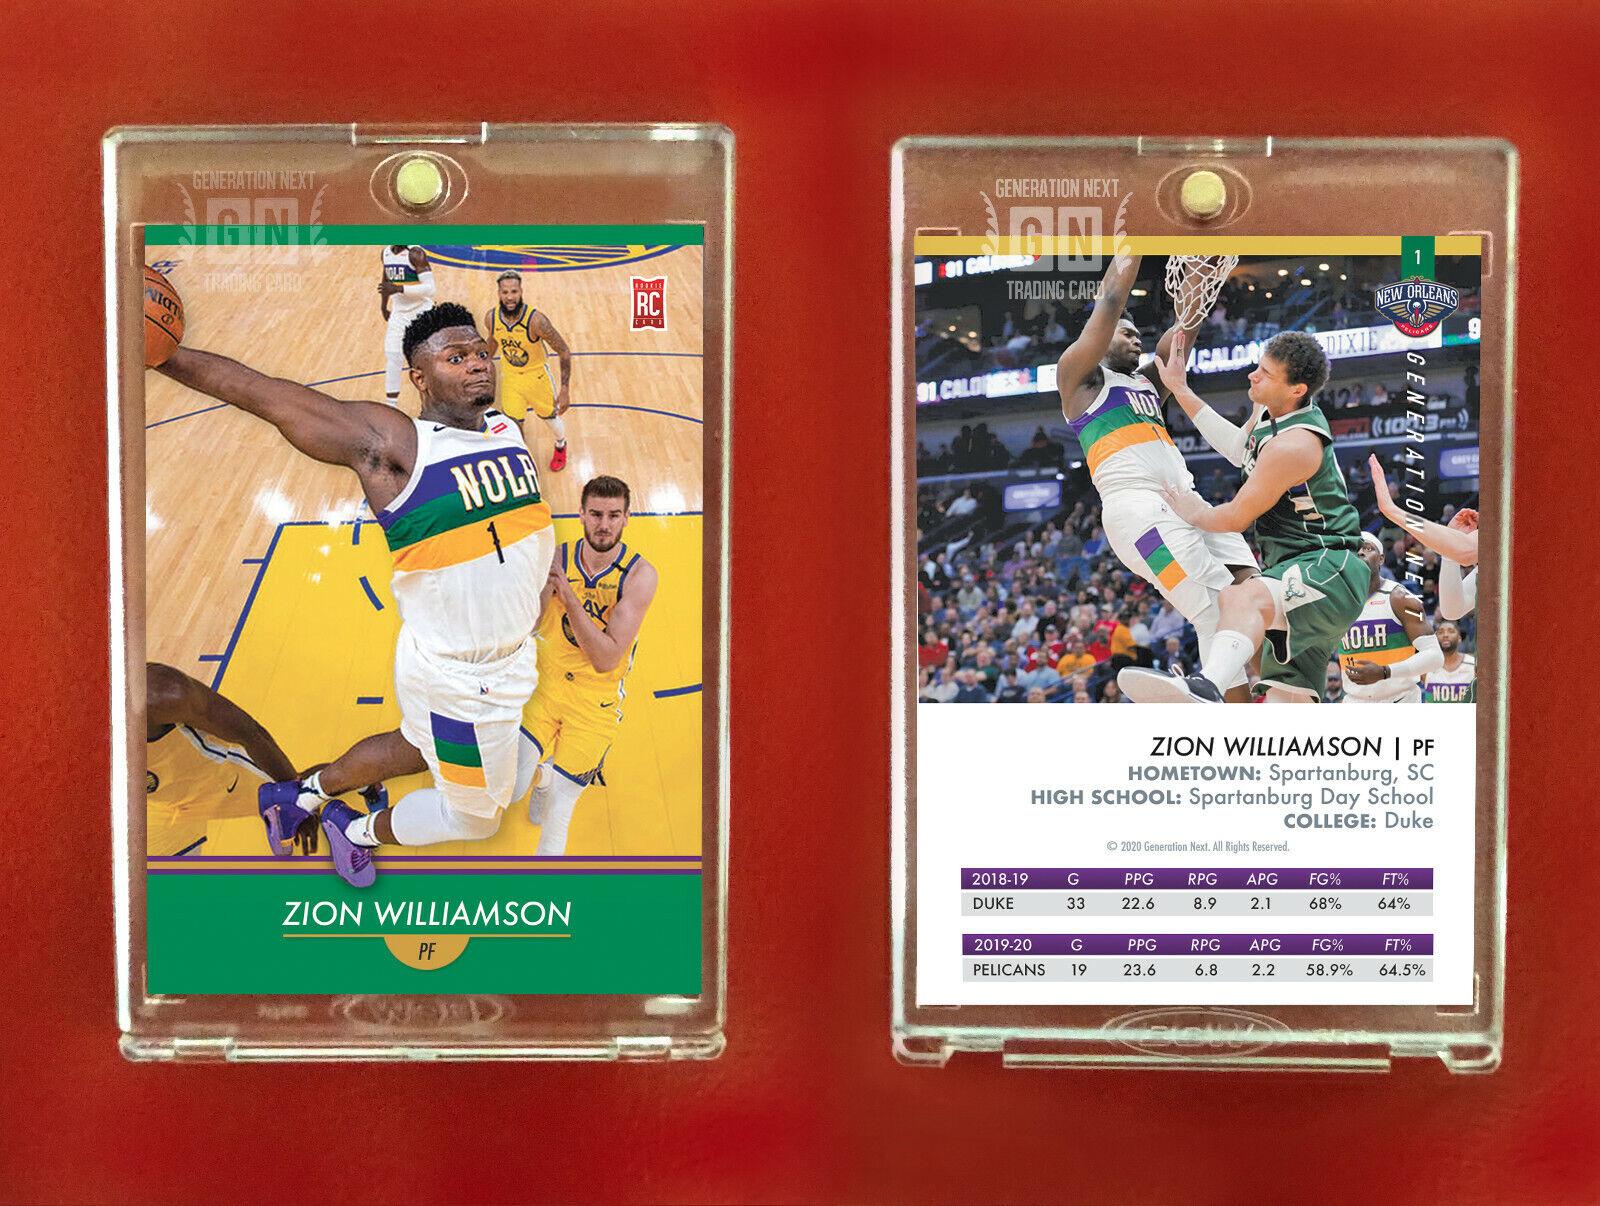 Zion Williamson Rookie Card / New Orleans Pelicans / Generation Next